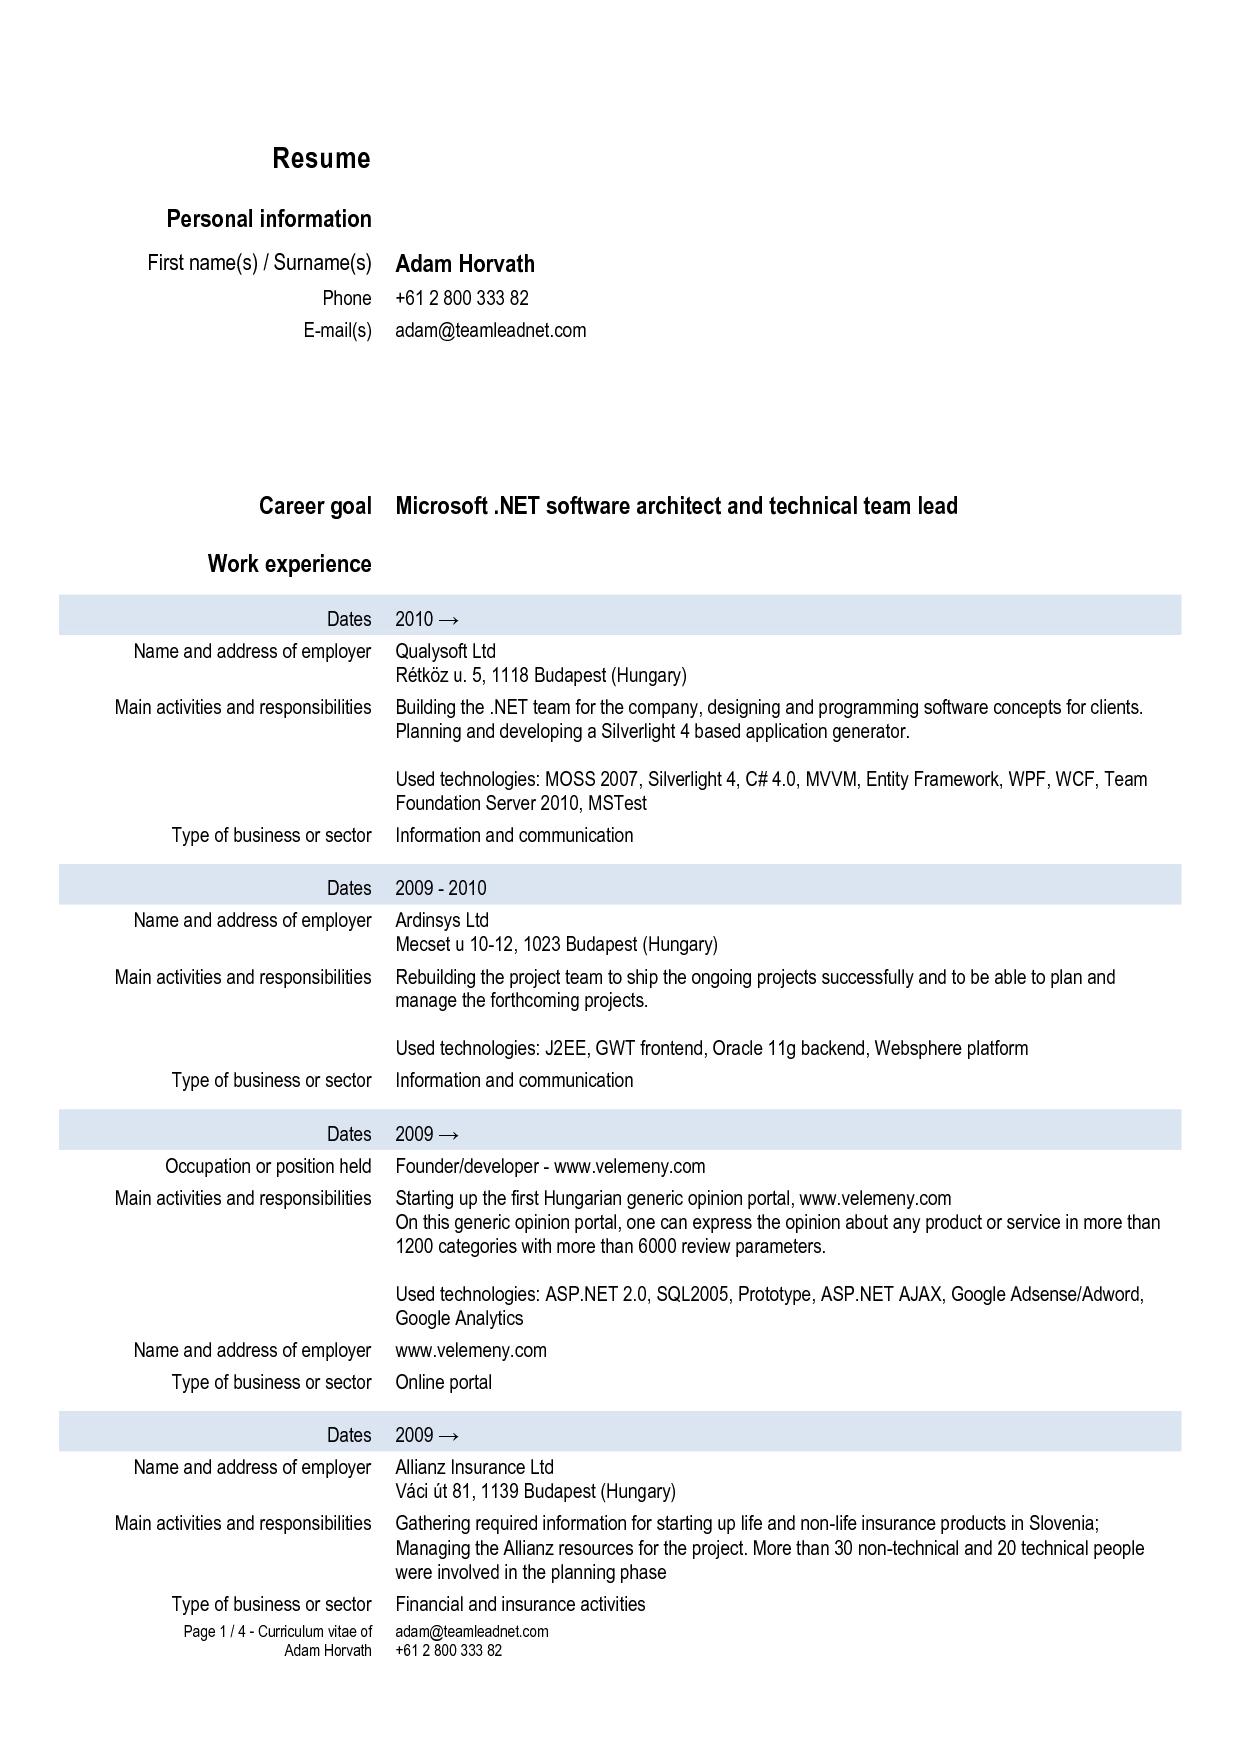 resume templates language proficiency levels language levels proficiency resume resumetemplates templates